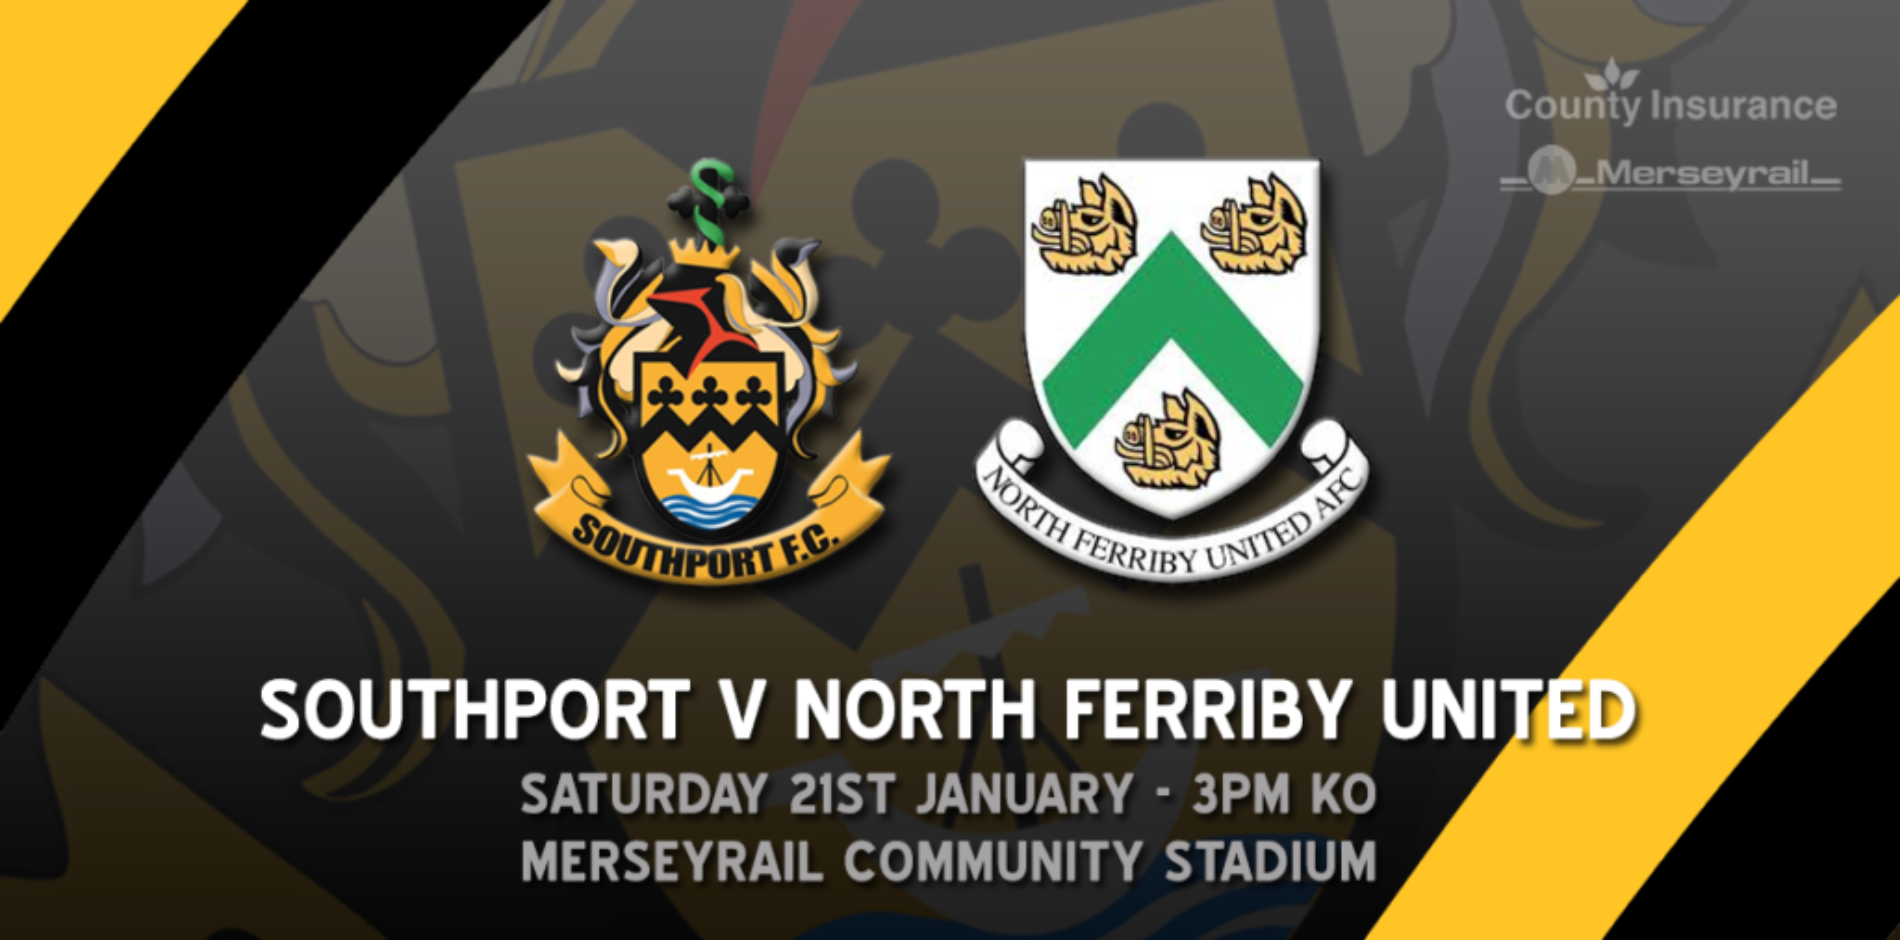 HIGHLIGHTS | Southport V North Ferriby United